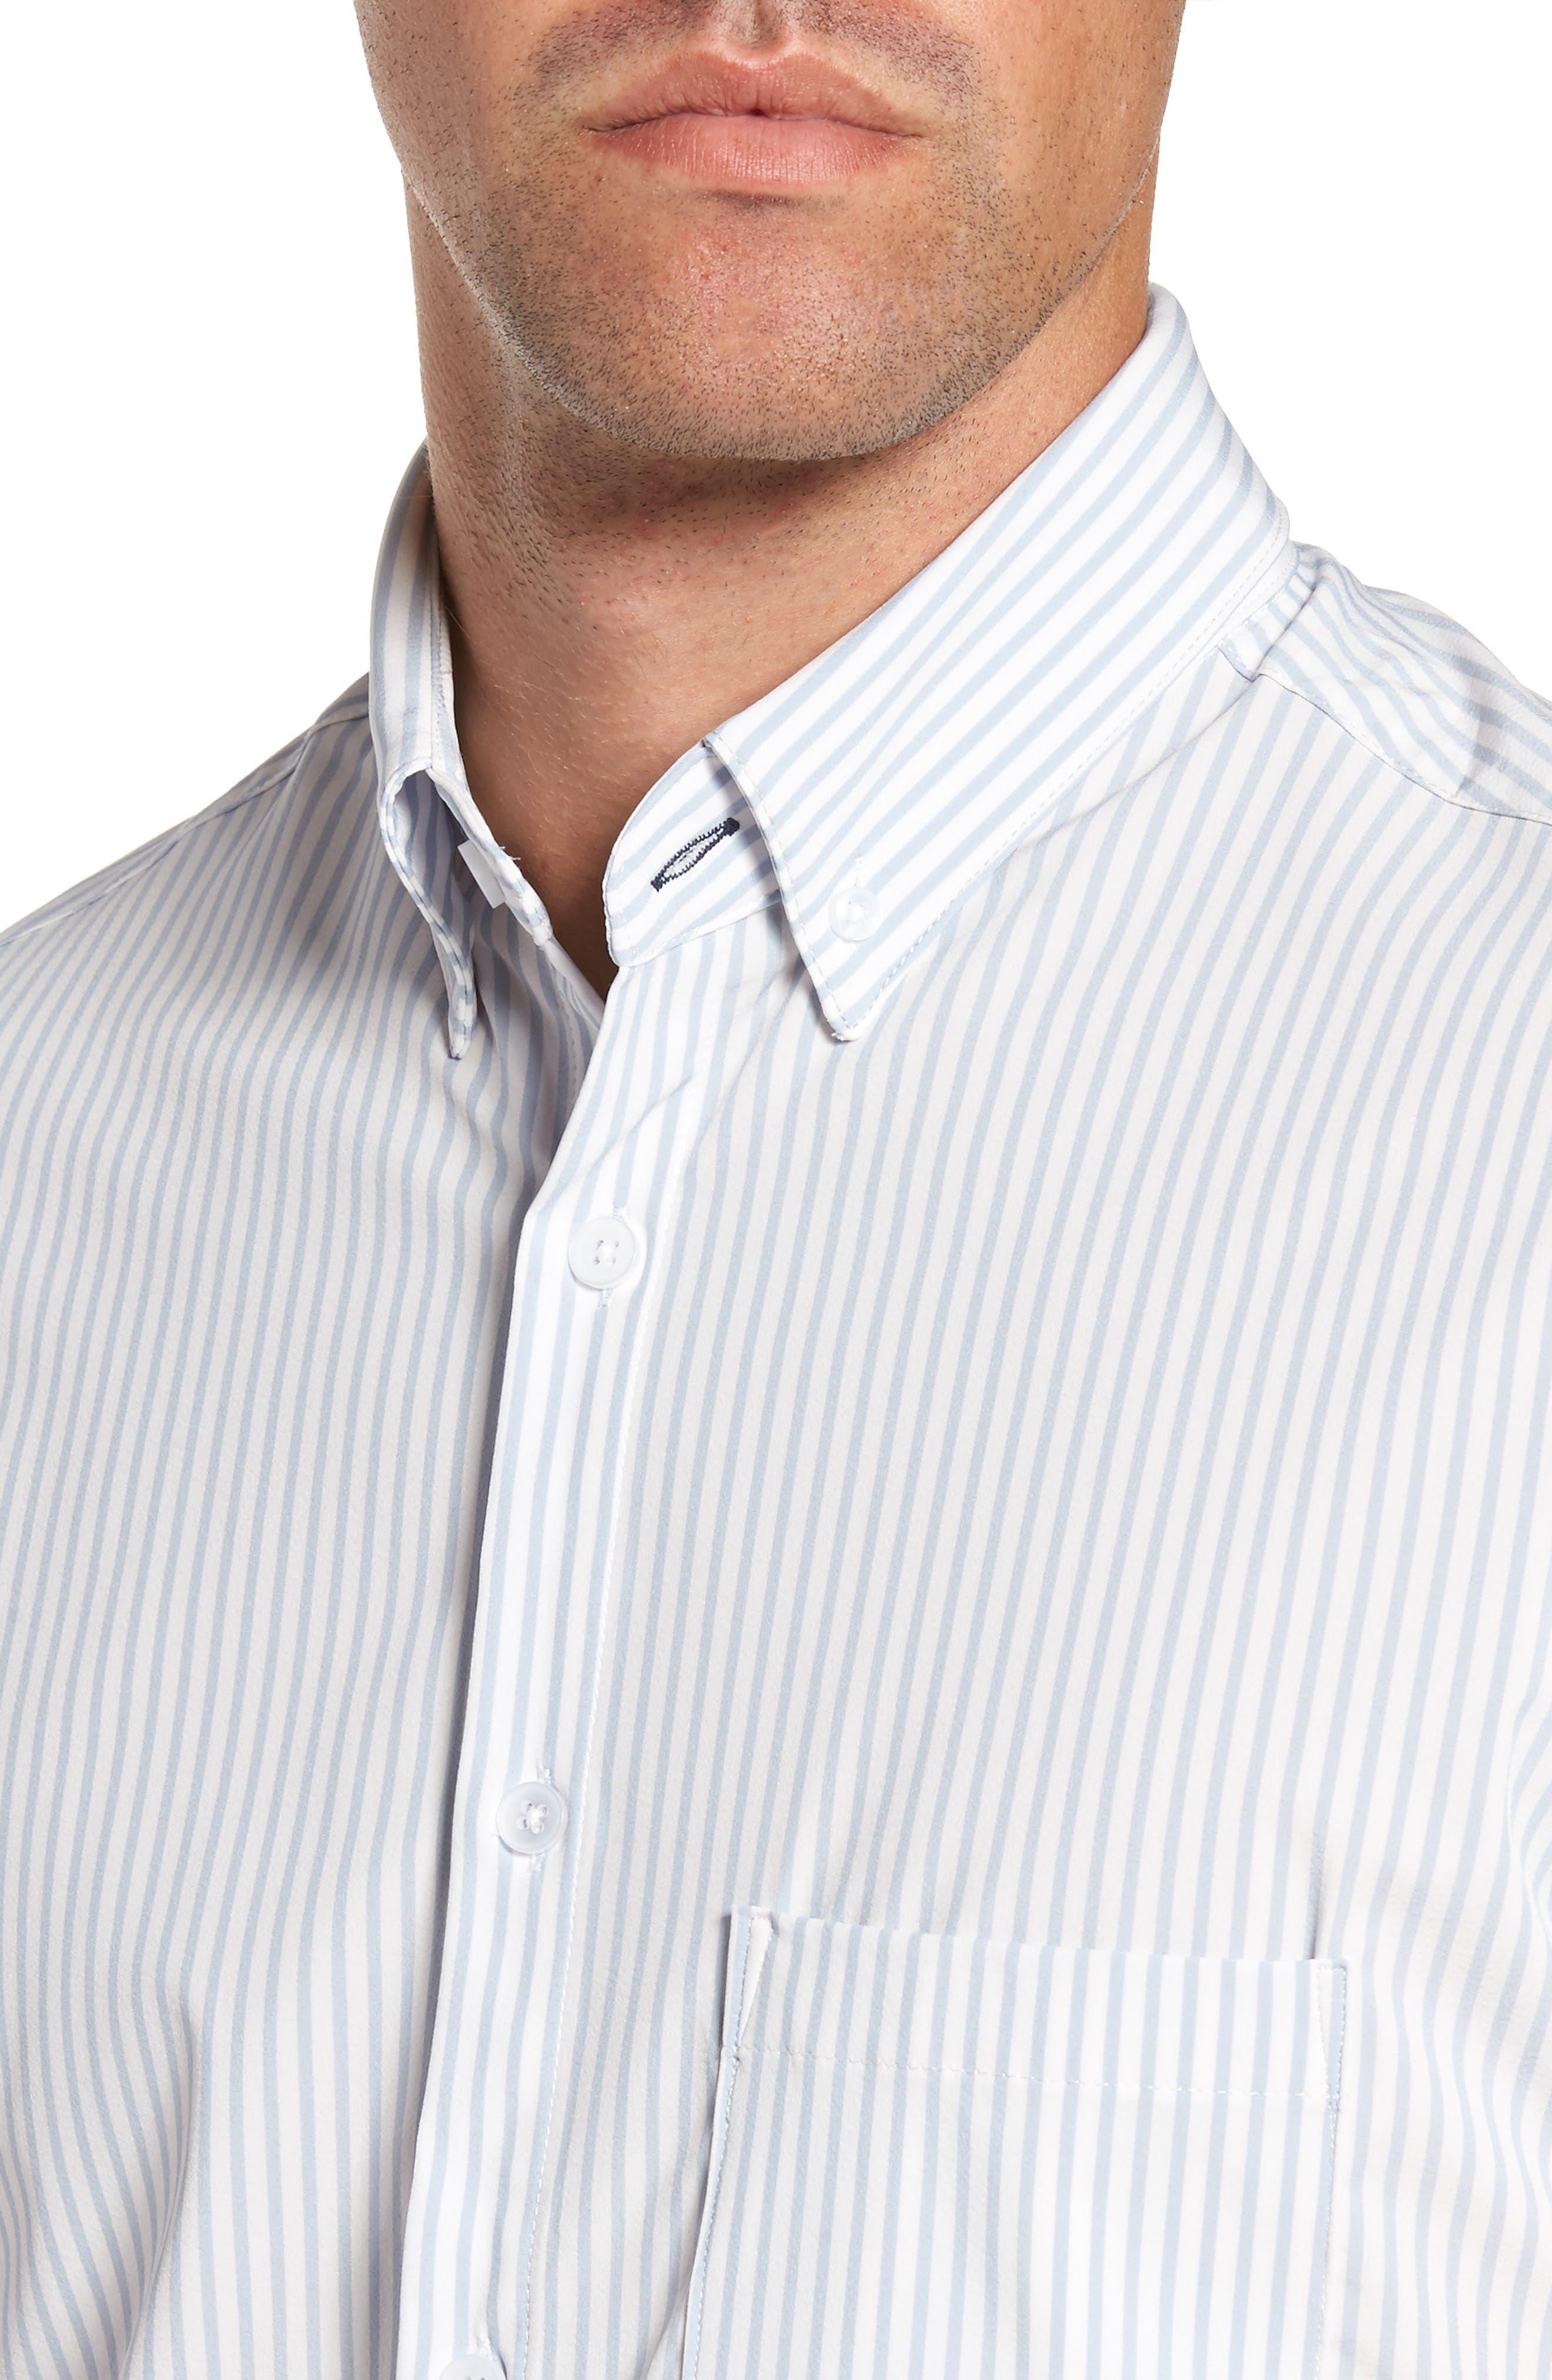 St. Elias Stripe Sport Shirt,                             Alternate thumbnail 4, color,                             100